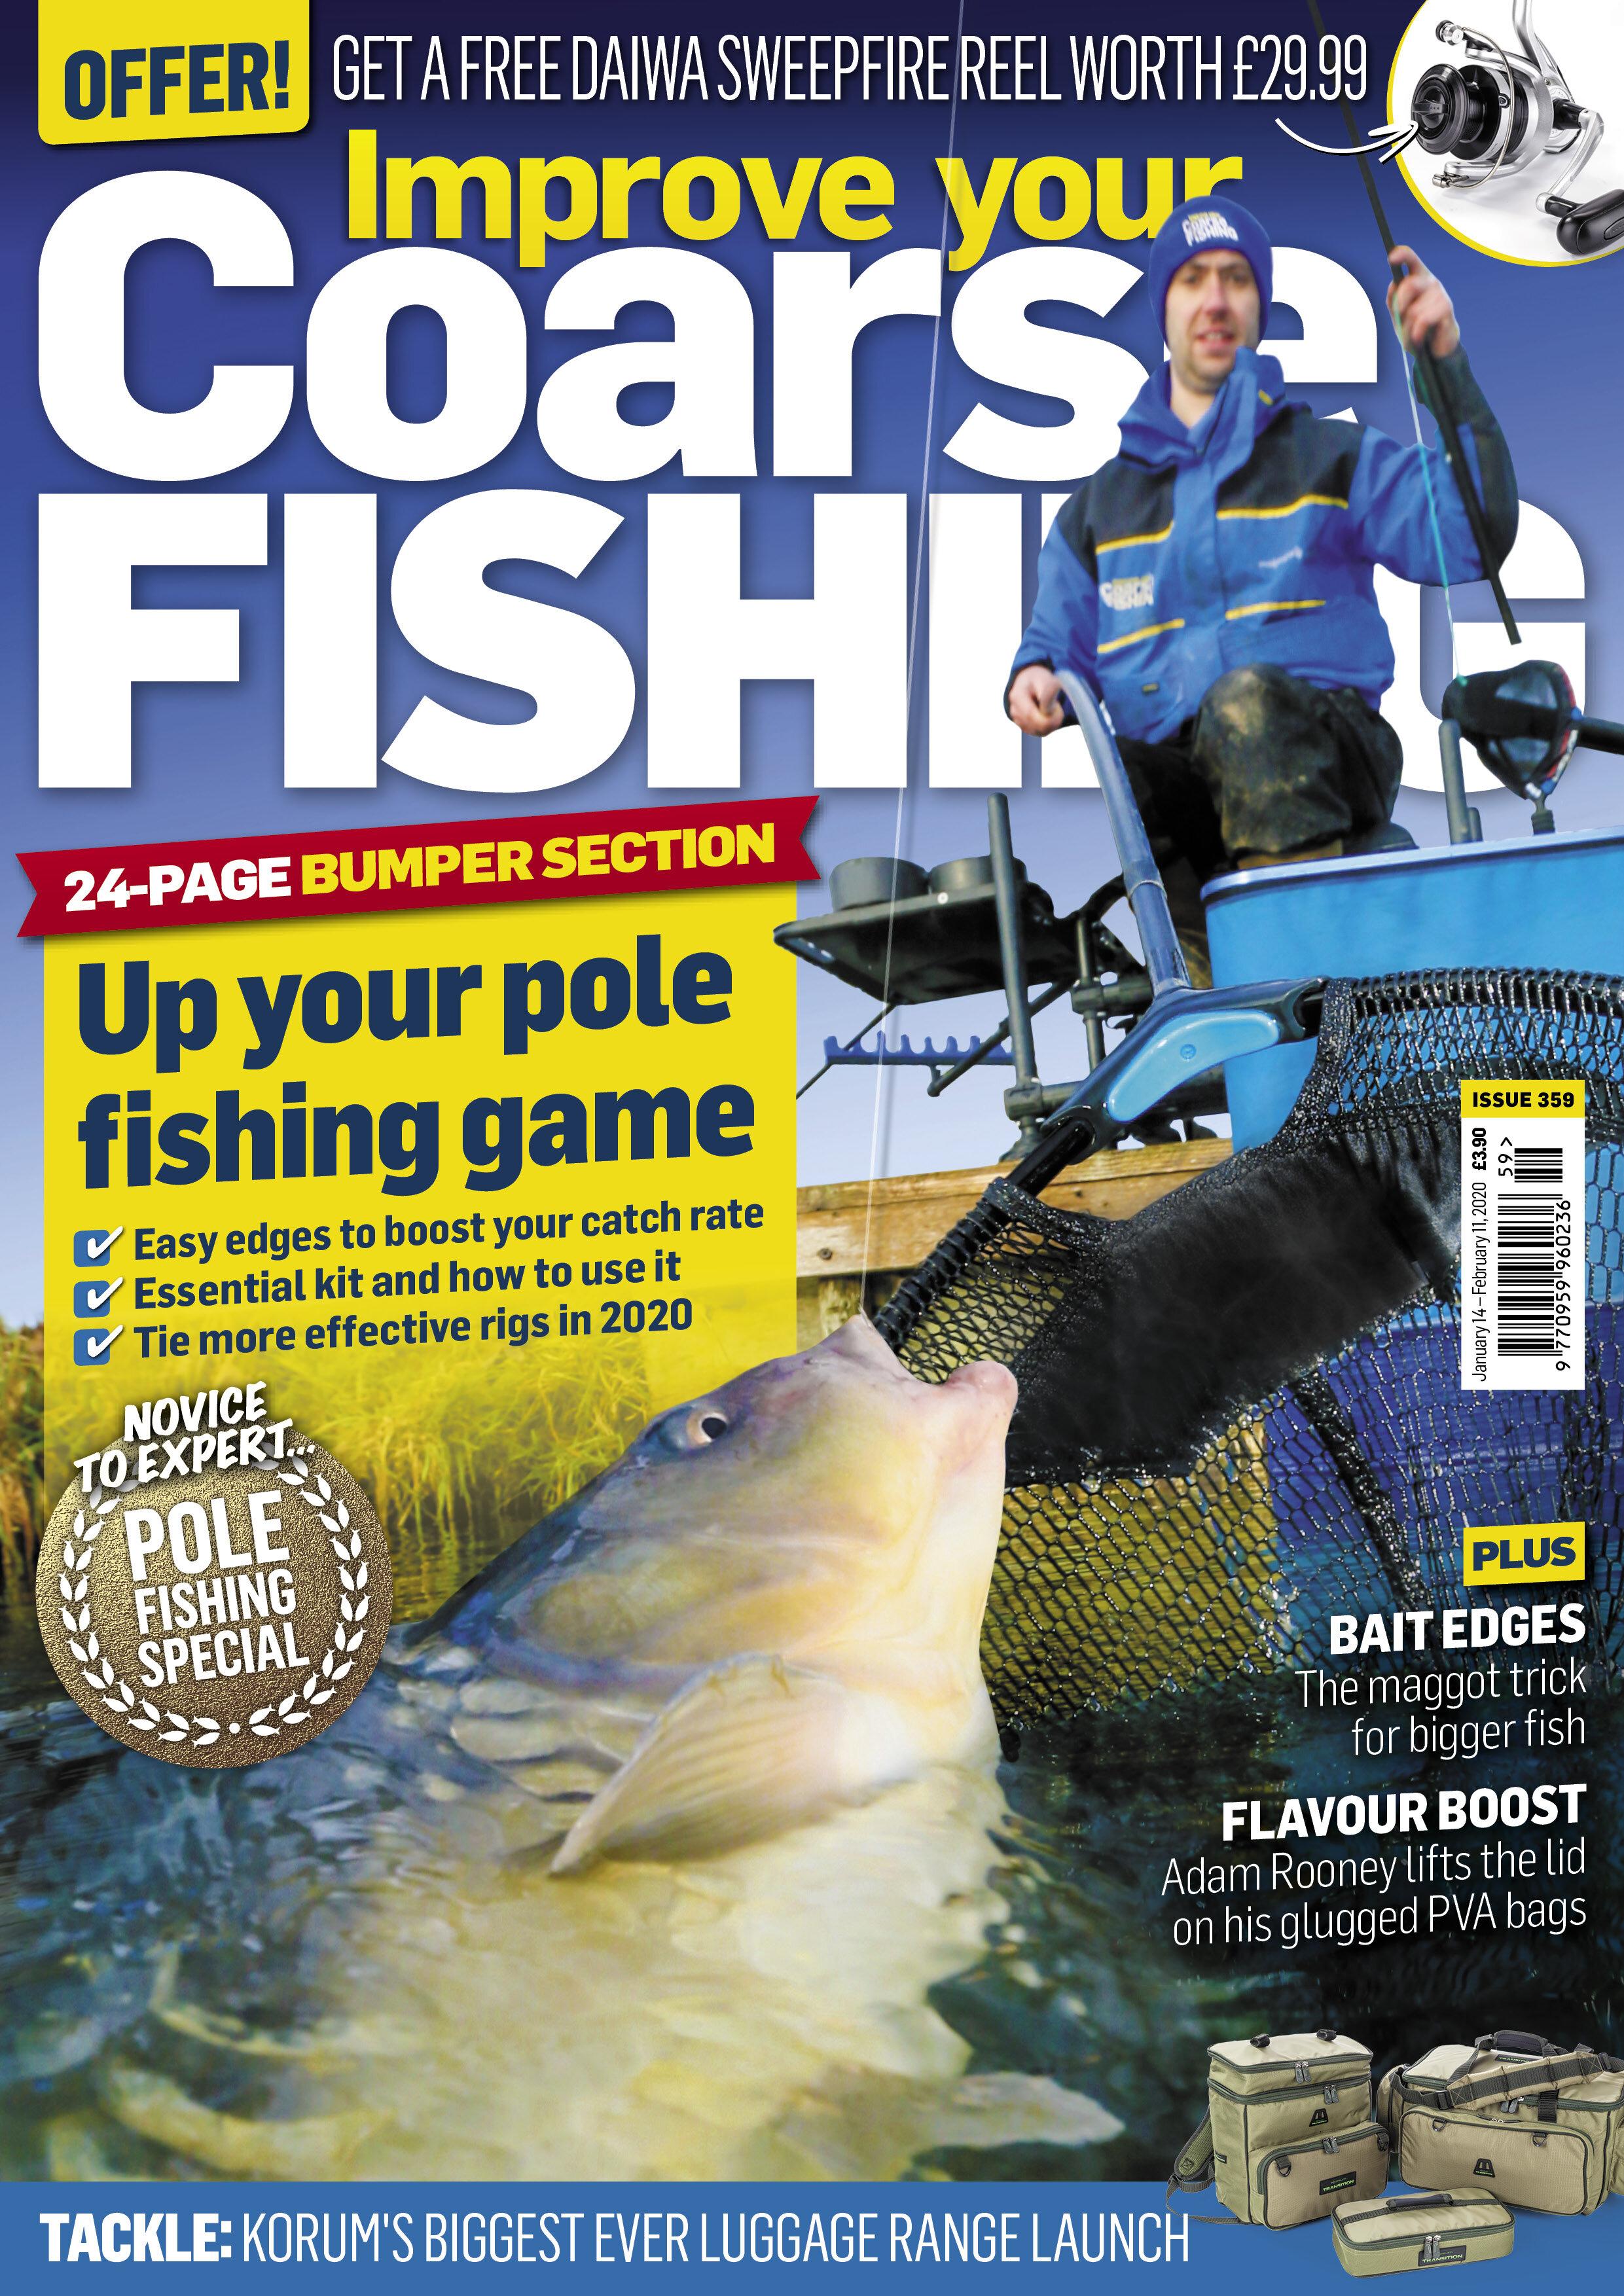 Korum Specialist Rig Essentials Coarse Fishing